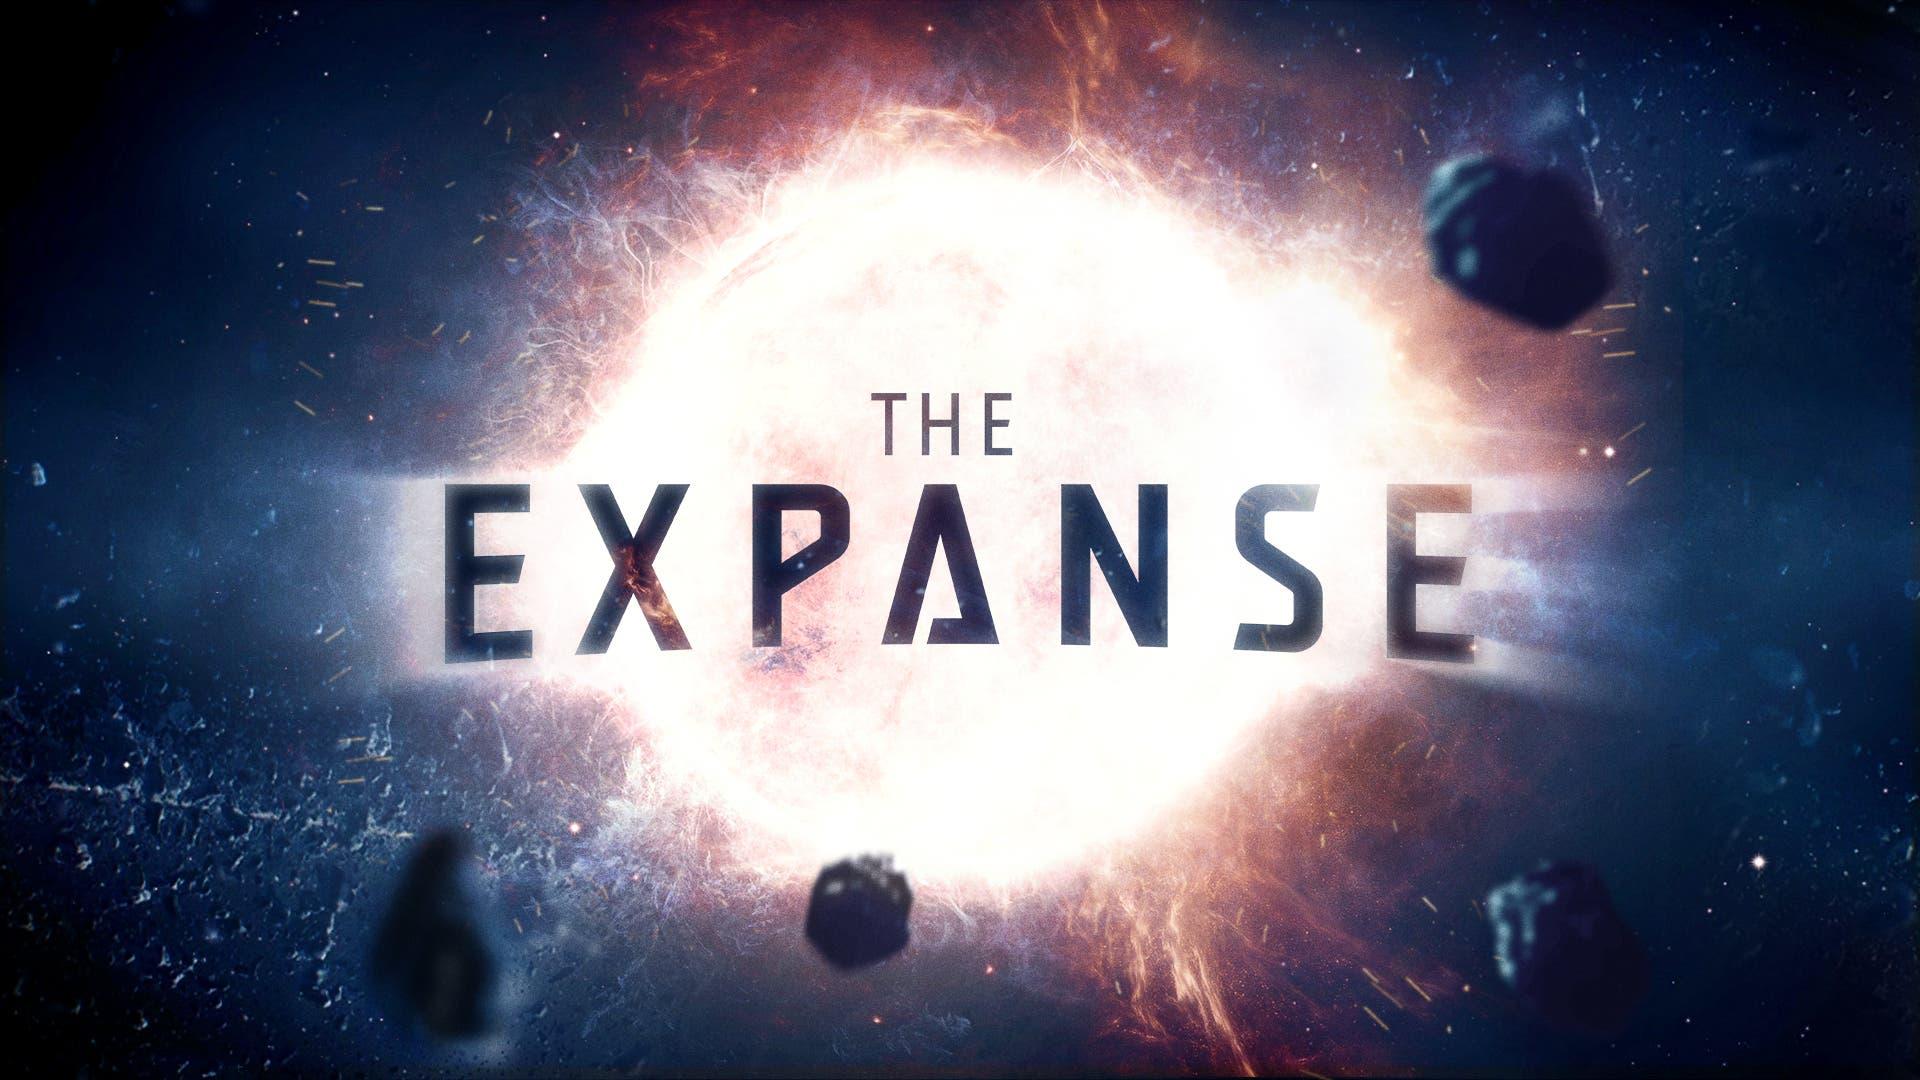 the-expanse-critica-netflix-1